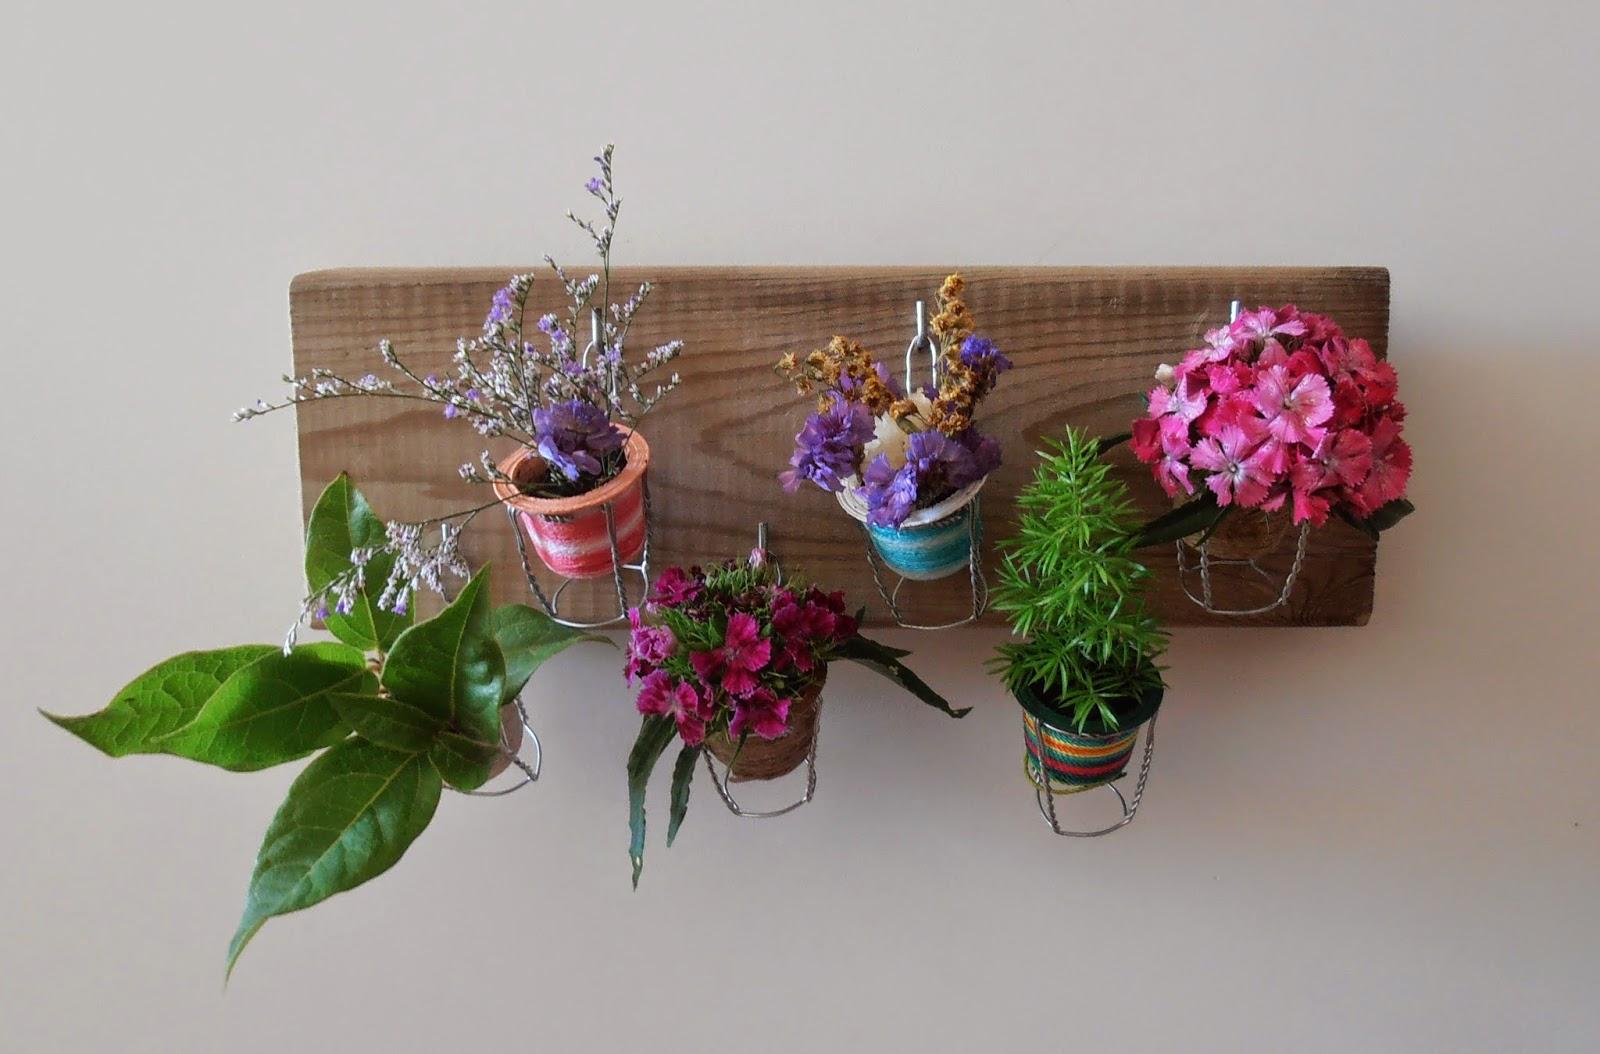 pequeño jardín con cápsulas de café